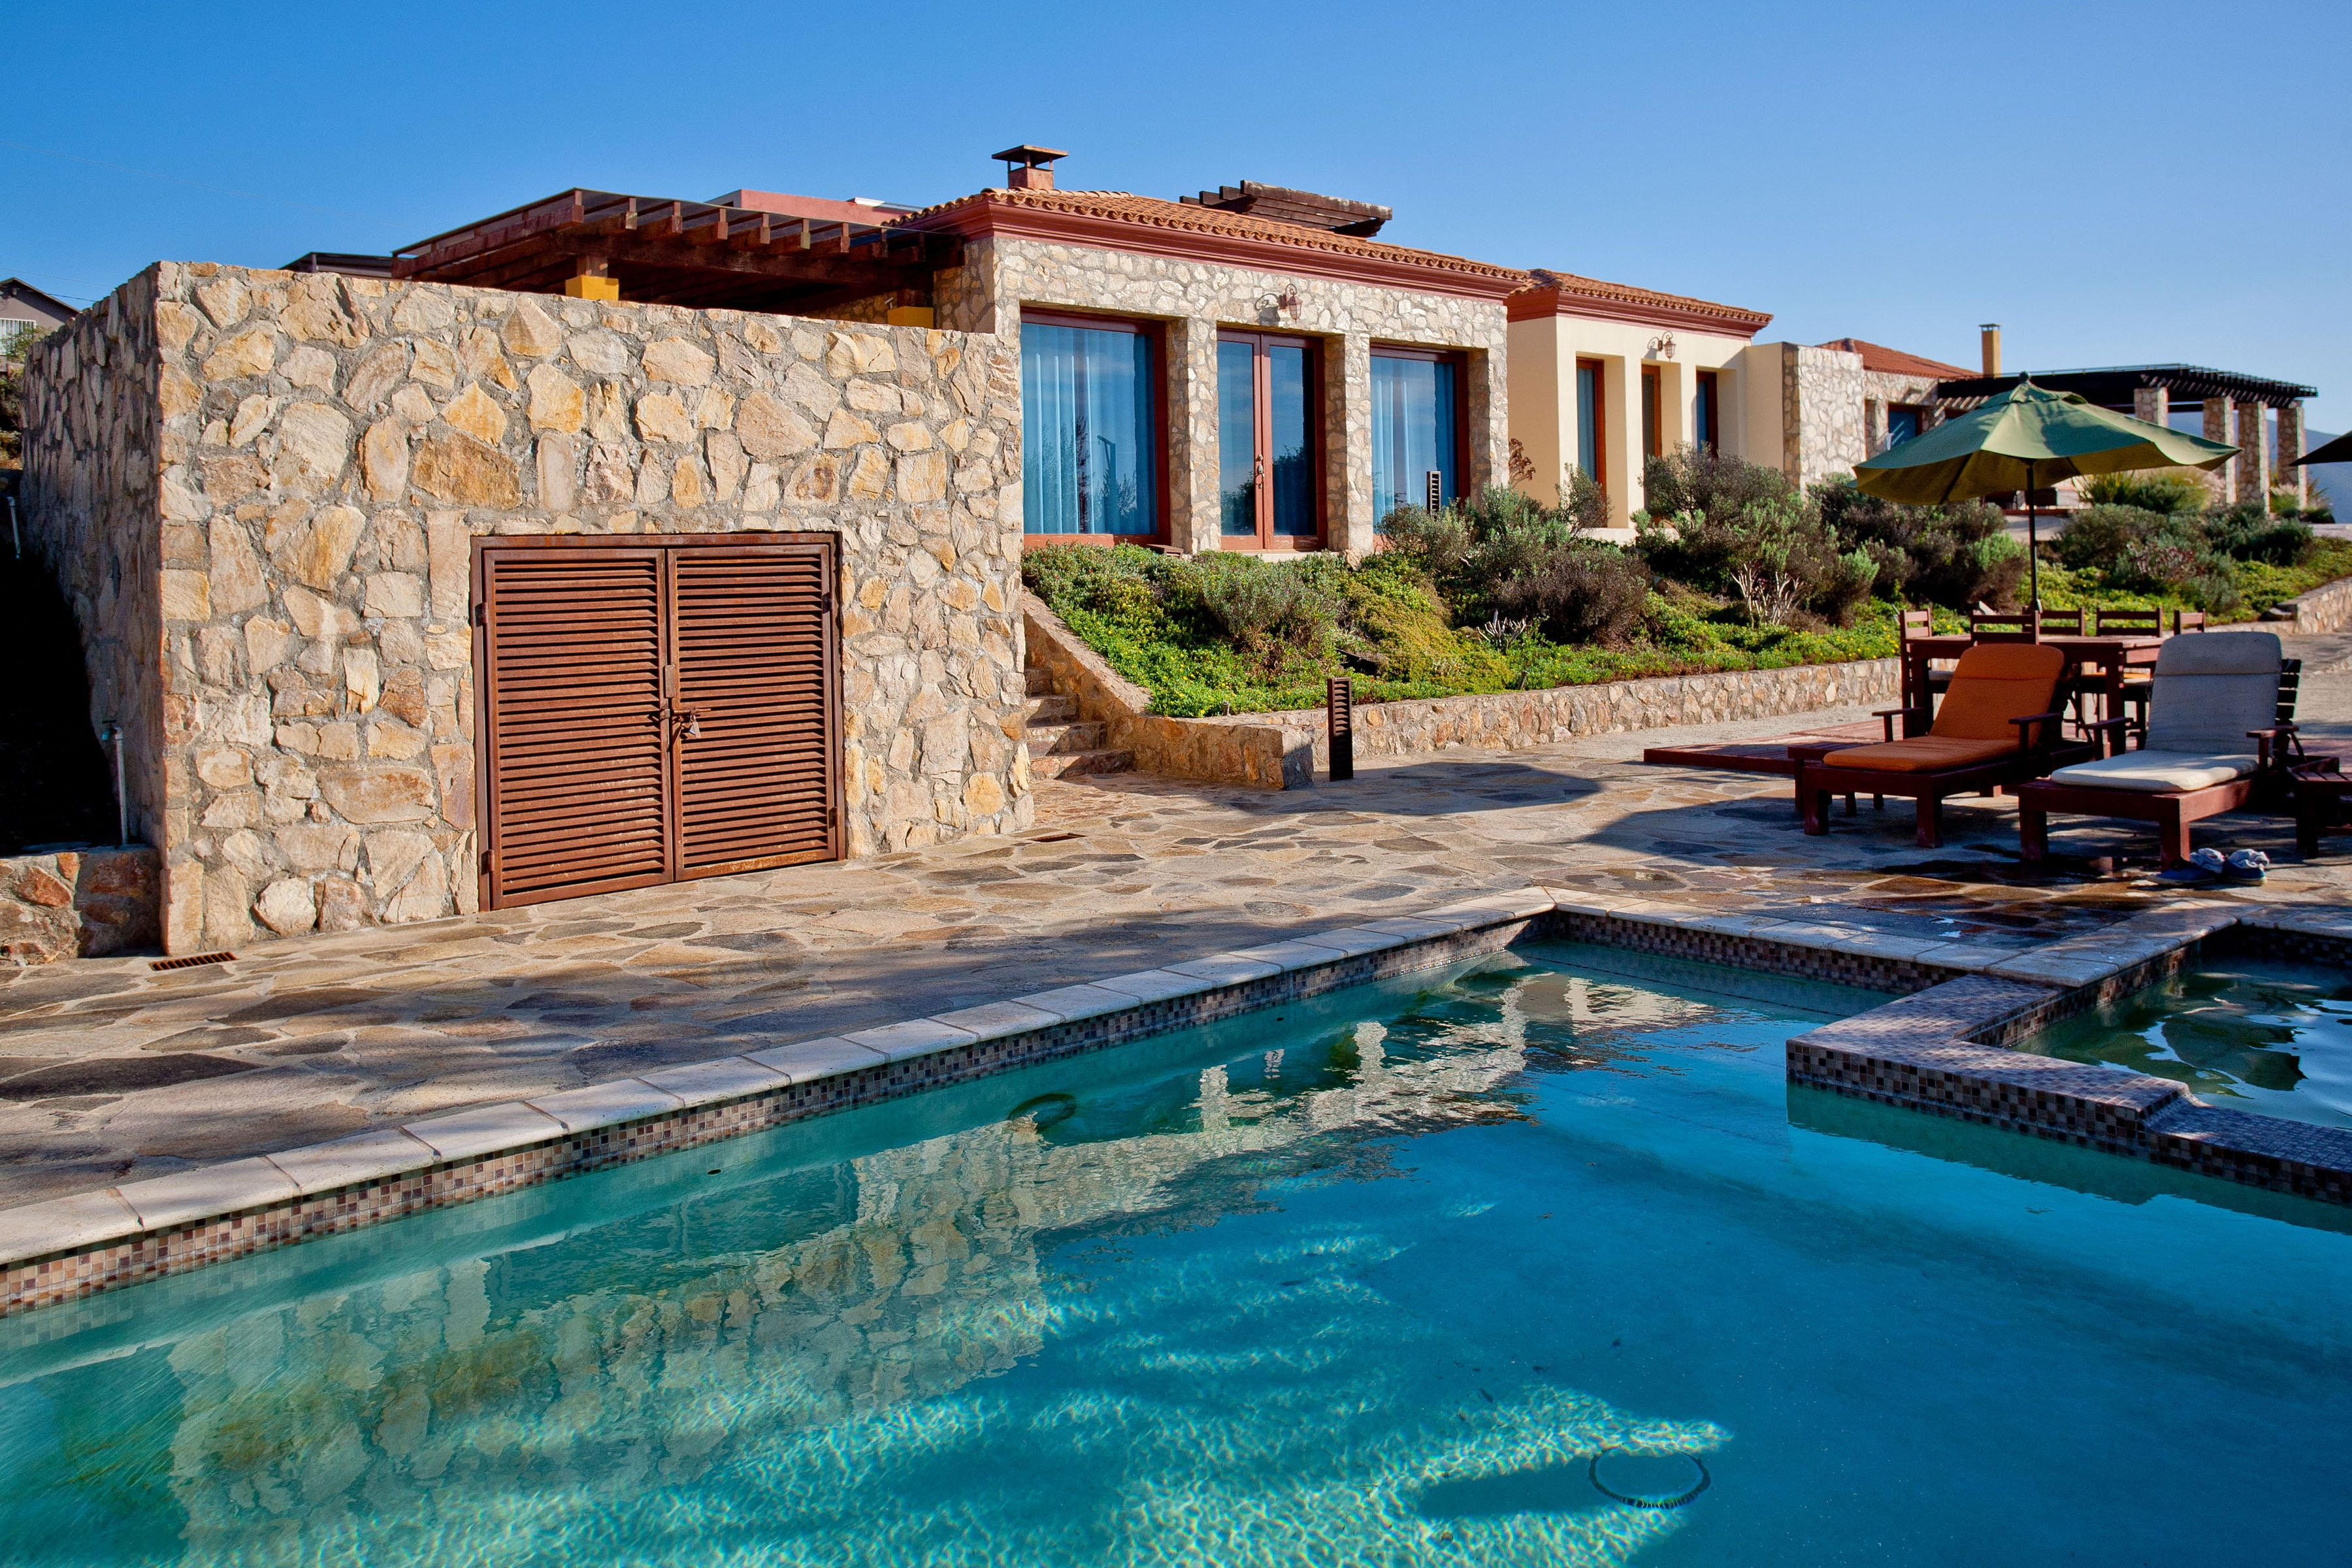 Viajes Valledeguadalupe Bajacalifornia Maglen Villas Travel Traveltips Wine Lifestyle Destination Vacaciones V Villas Valle De Guadalupe Vacaciones